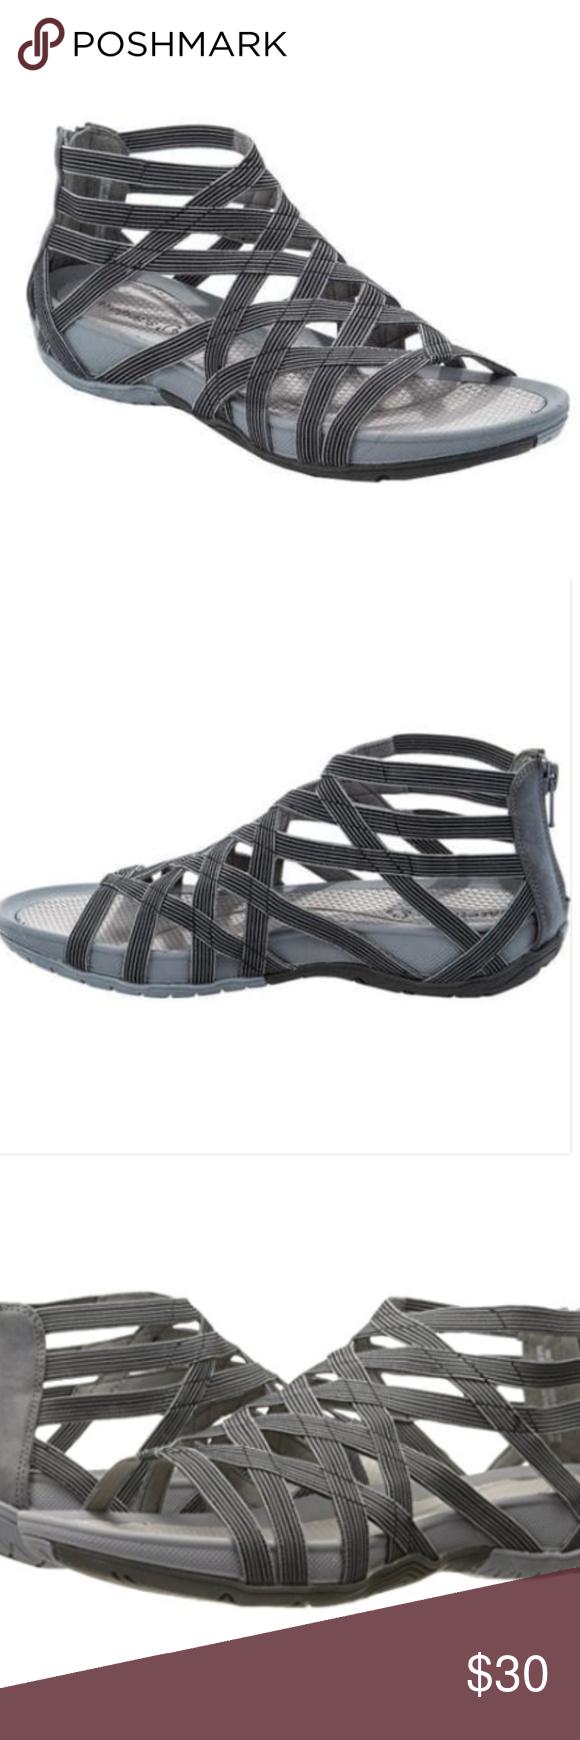 9c8dc114518 BareTraps Rebound Samina Gladiator Sandal Size 10 New without box. Let the Bare  Traps Samina